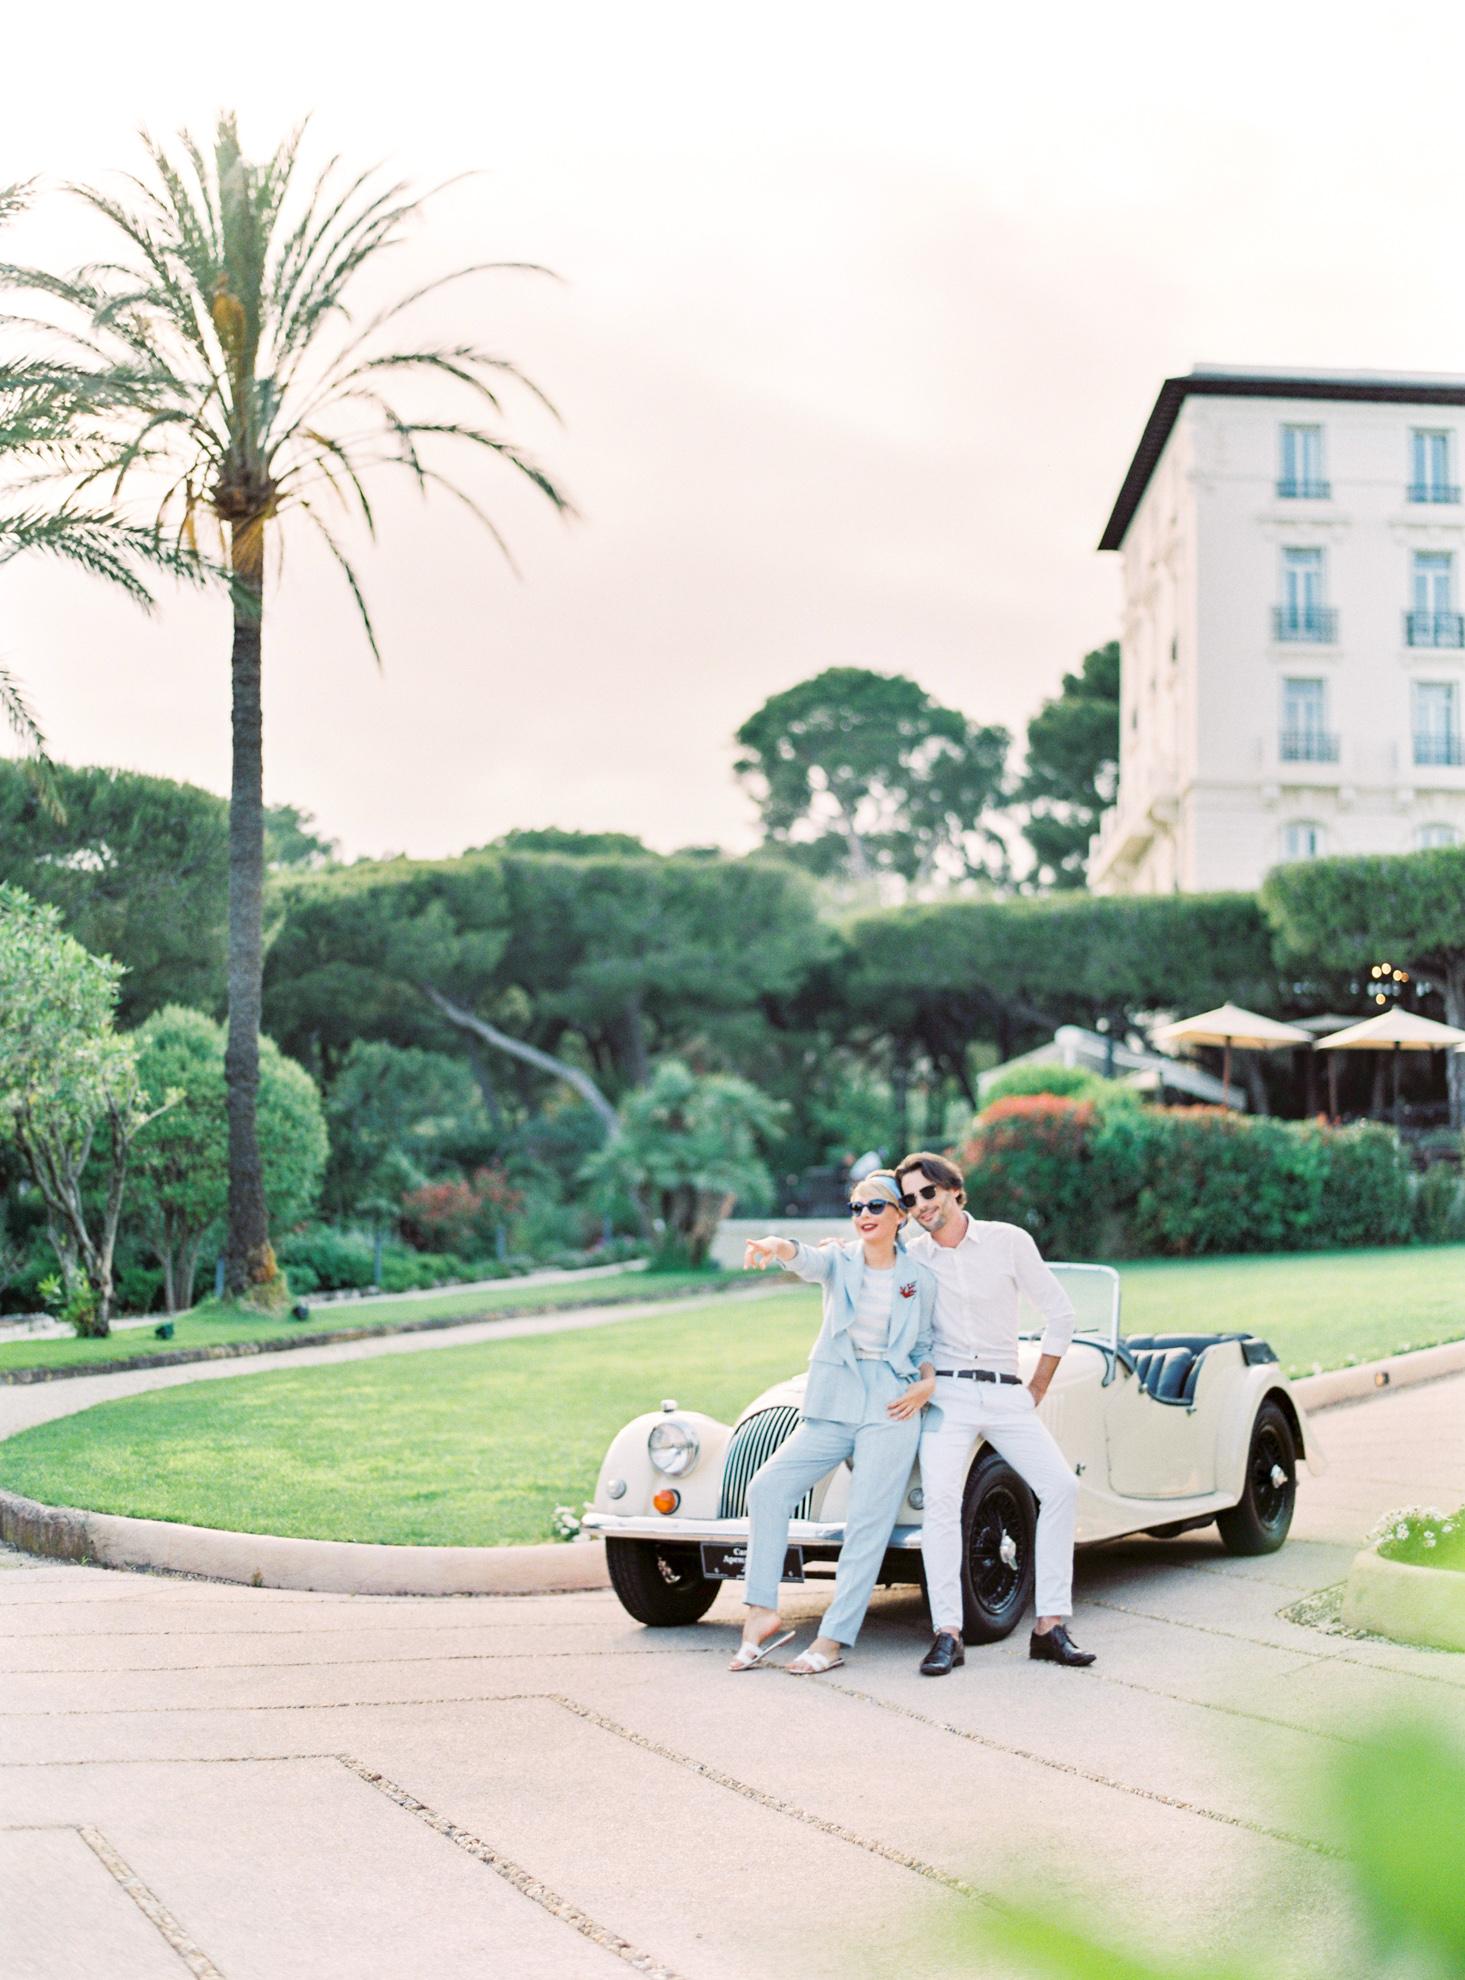 059 Grand Hotel du Cap Ferrat Fine Art Engagement Photography Session by Tony Gigov